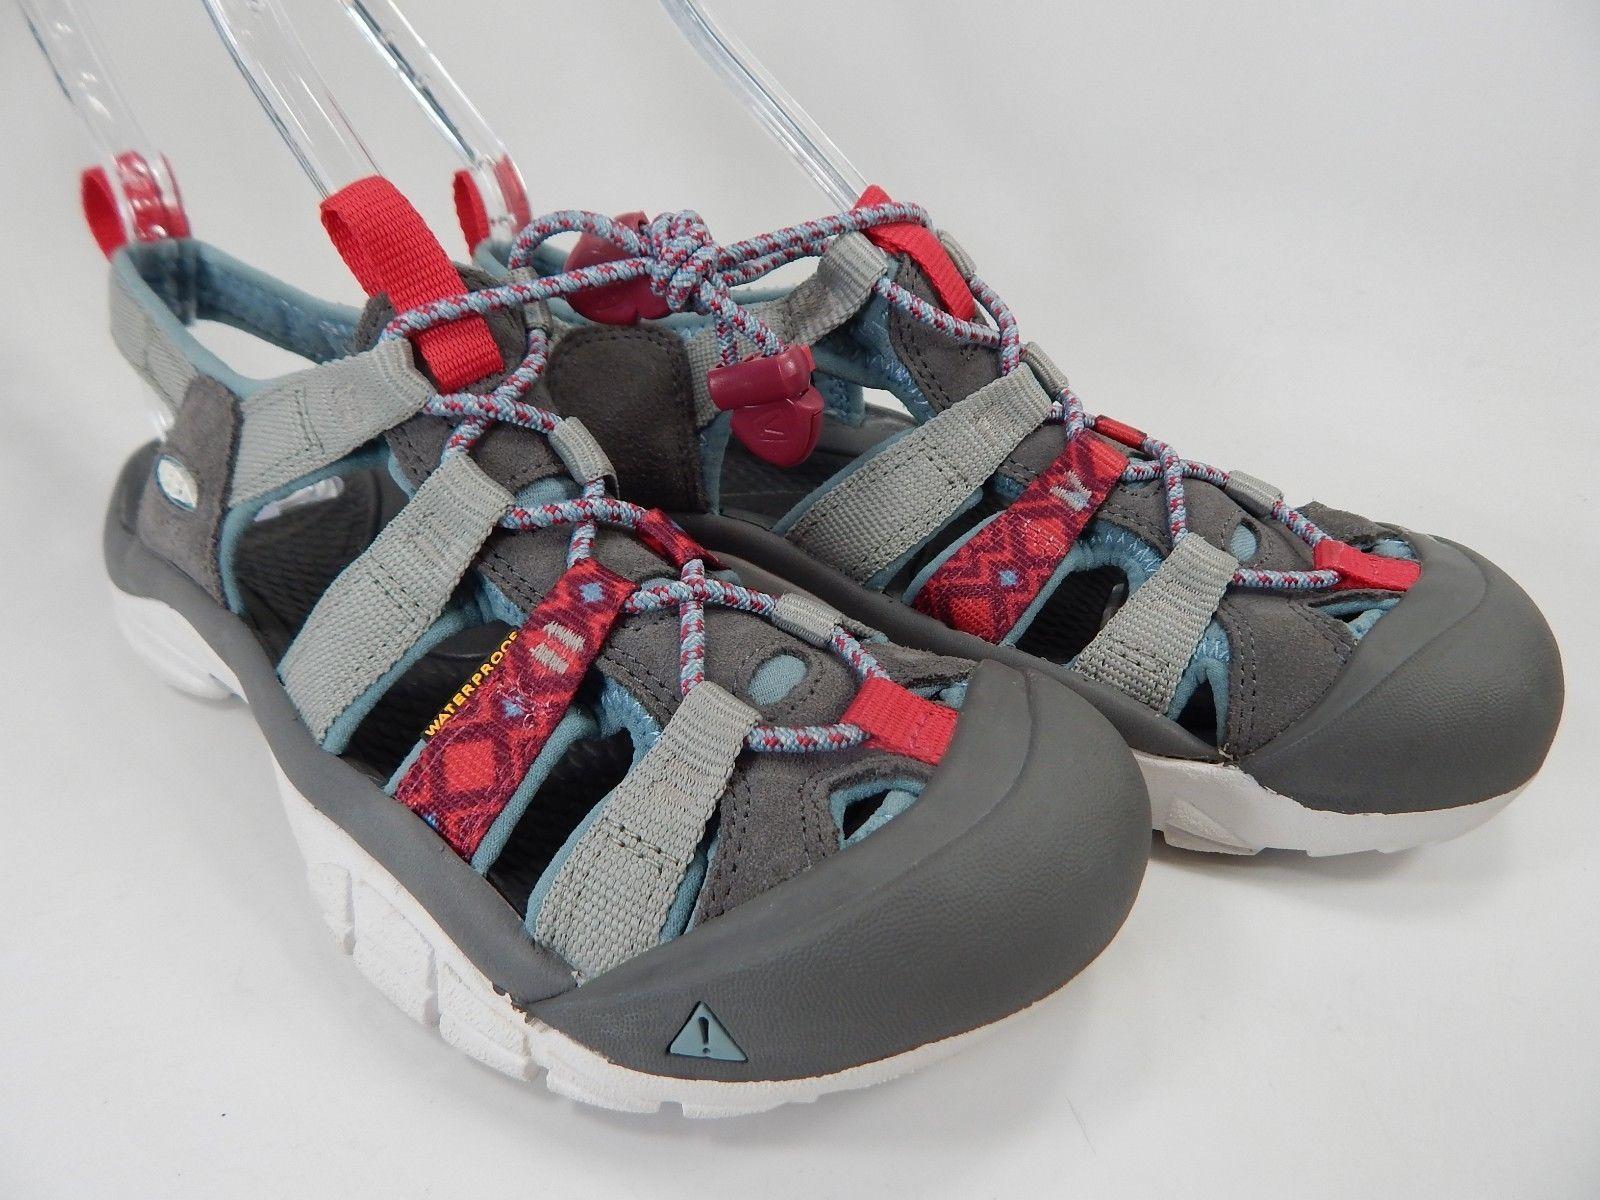 Keen Newport H2 Size US 7 M EU 37.5 Women's Sports Sandals Gray / Red / White